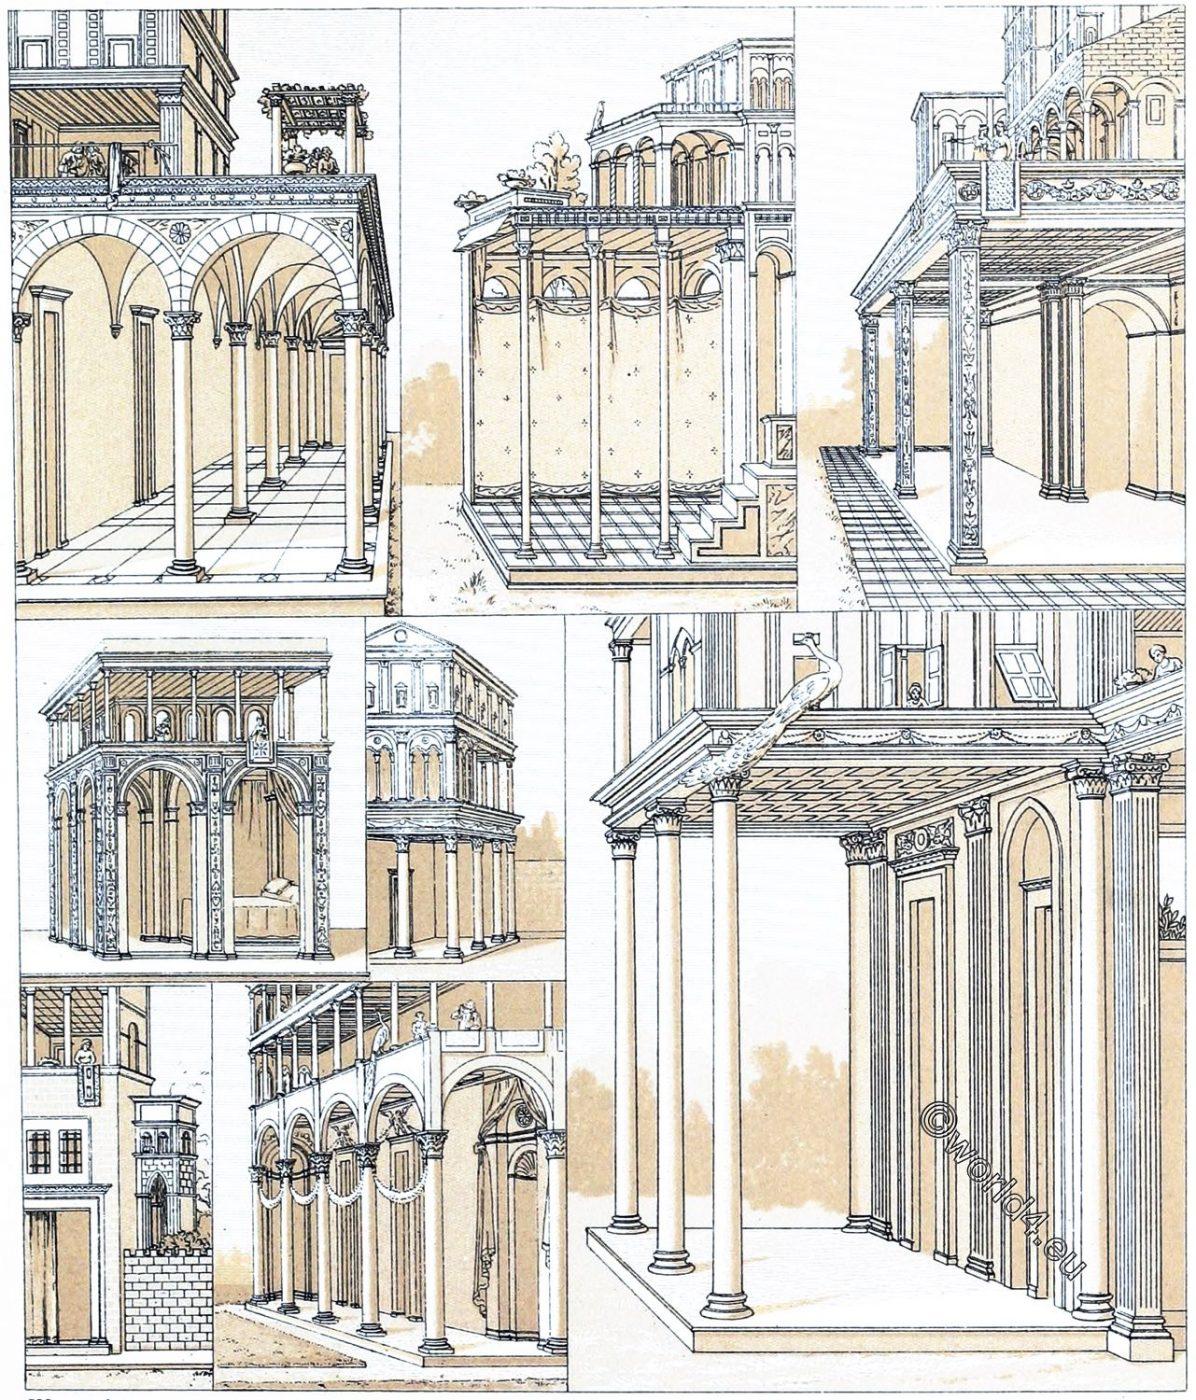 Renaissance, Architecture, Italy, Tuscany, portico, loggia, pilasters